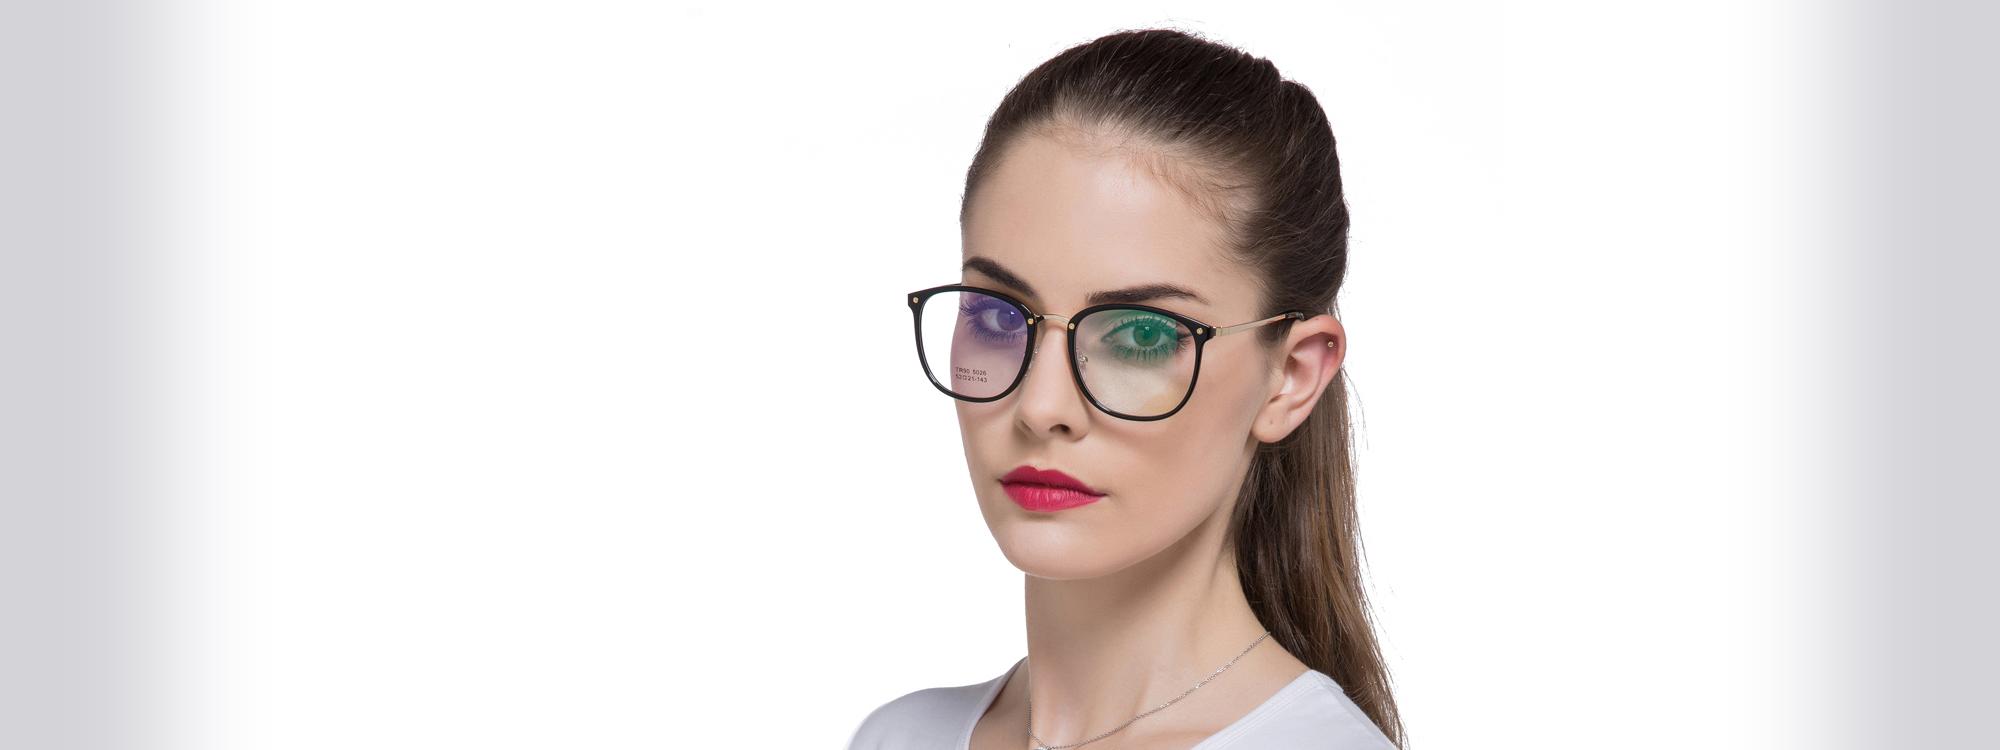 543f65dba98 Avenue Optical - Opticians Brampton - Optometrist and Eye Doctor Brampton - Best  Optical Store - Low Cost Colored Contact Lenses Bampton - Bifocal Glasses  ...